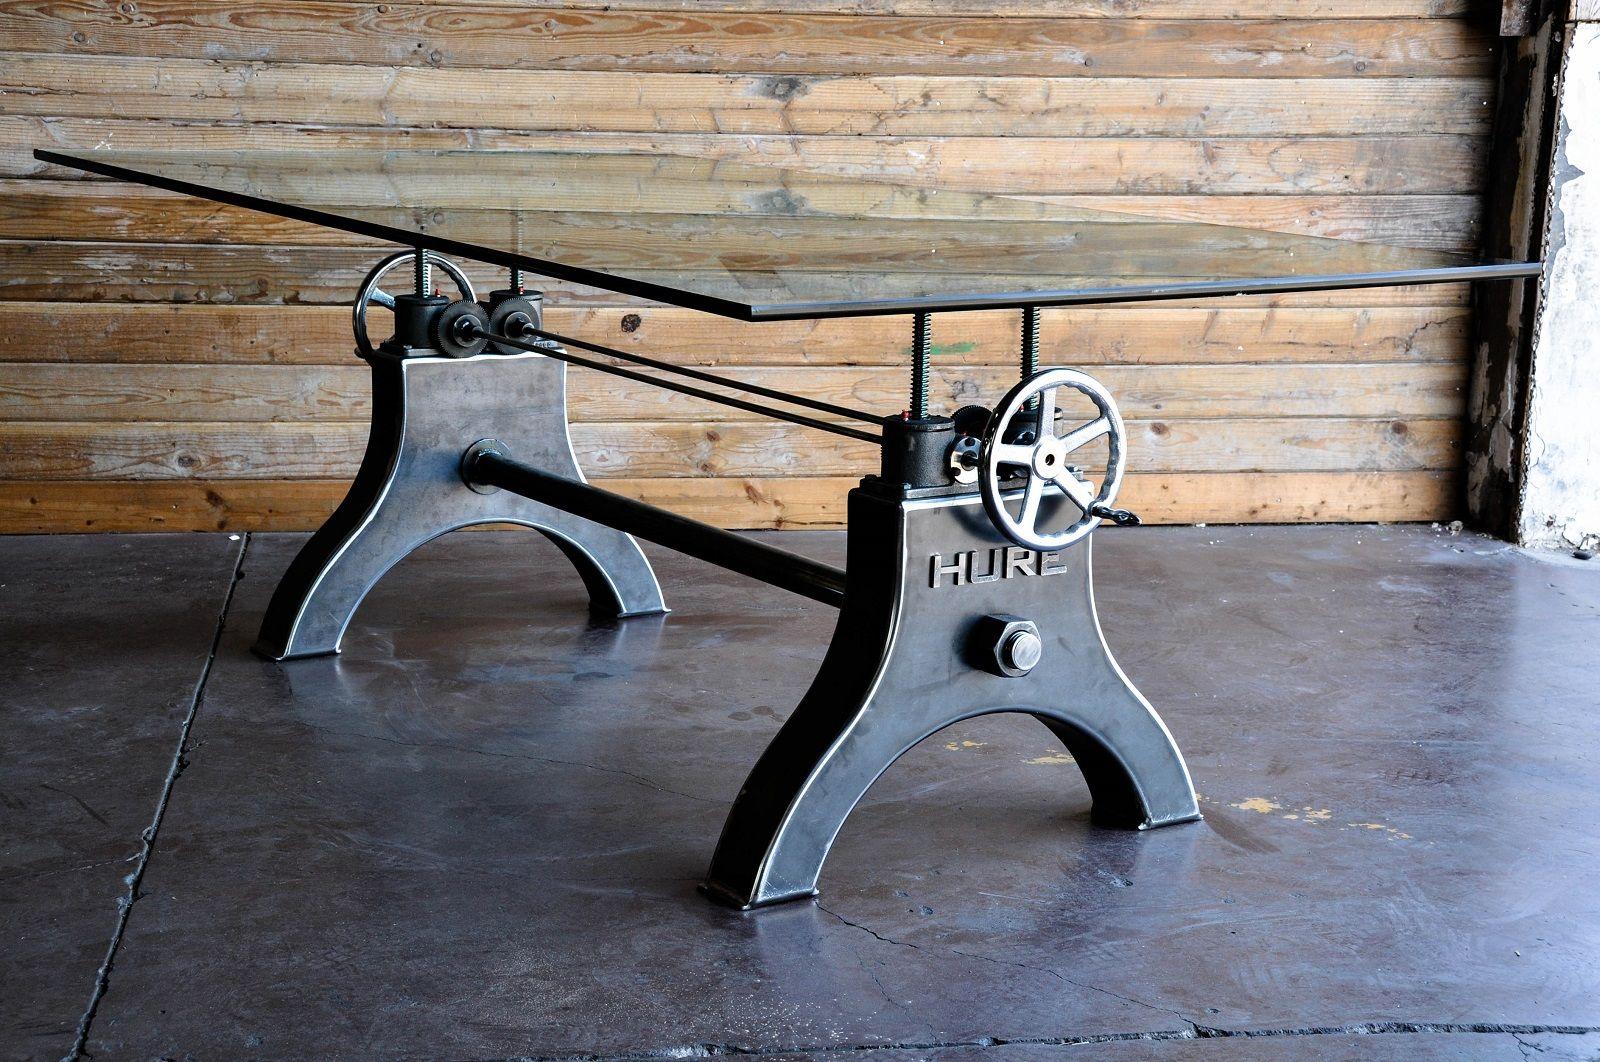 Hure crank table vintage industrial furniture - Hure Crank Table Vintage Industrial Furnitureindustrial